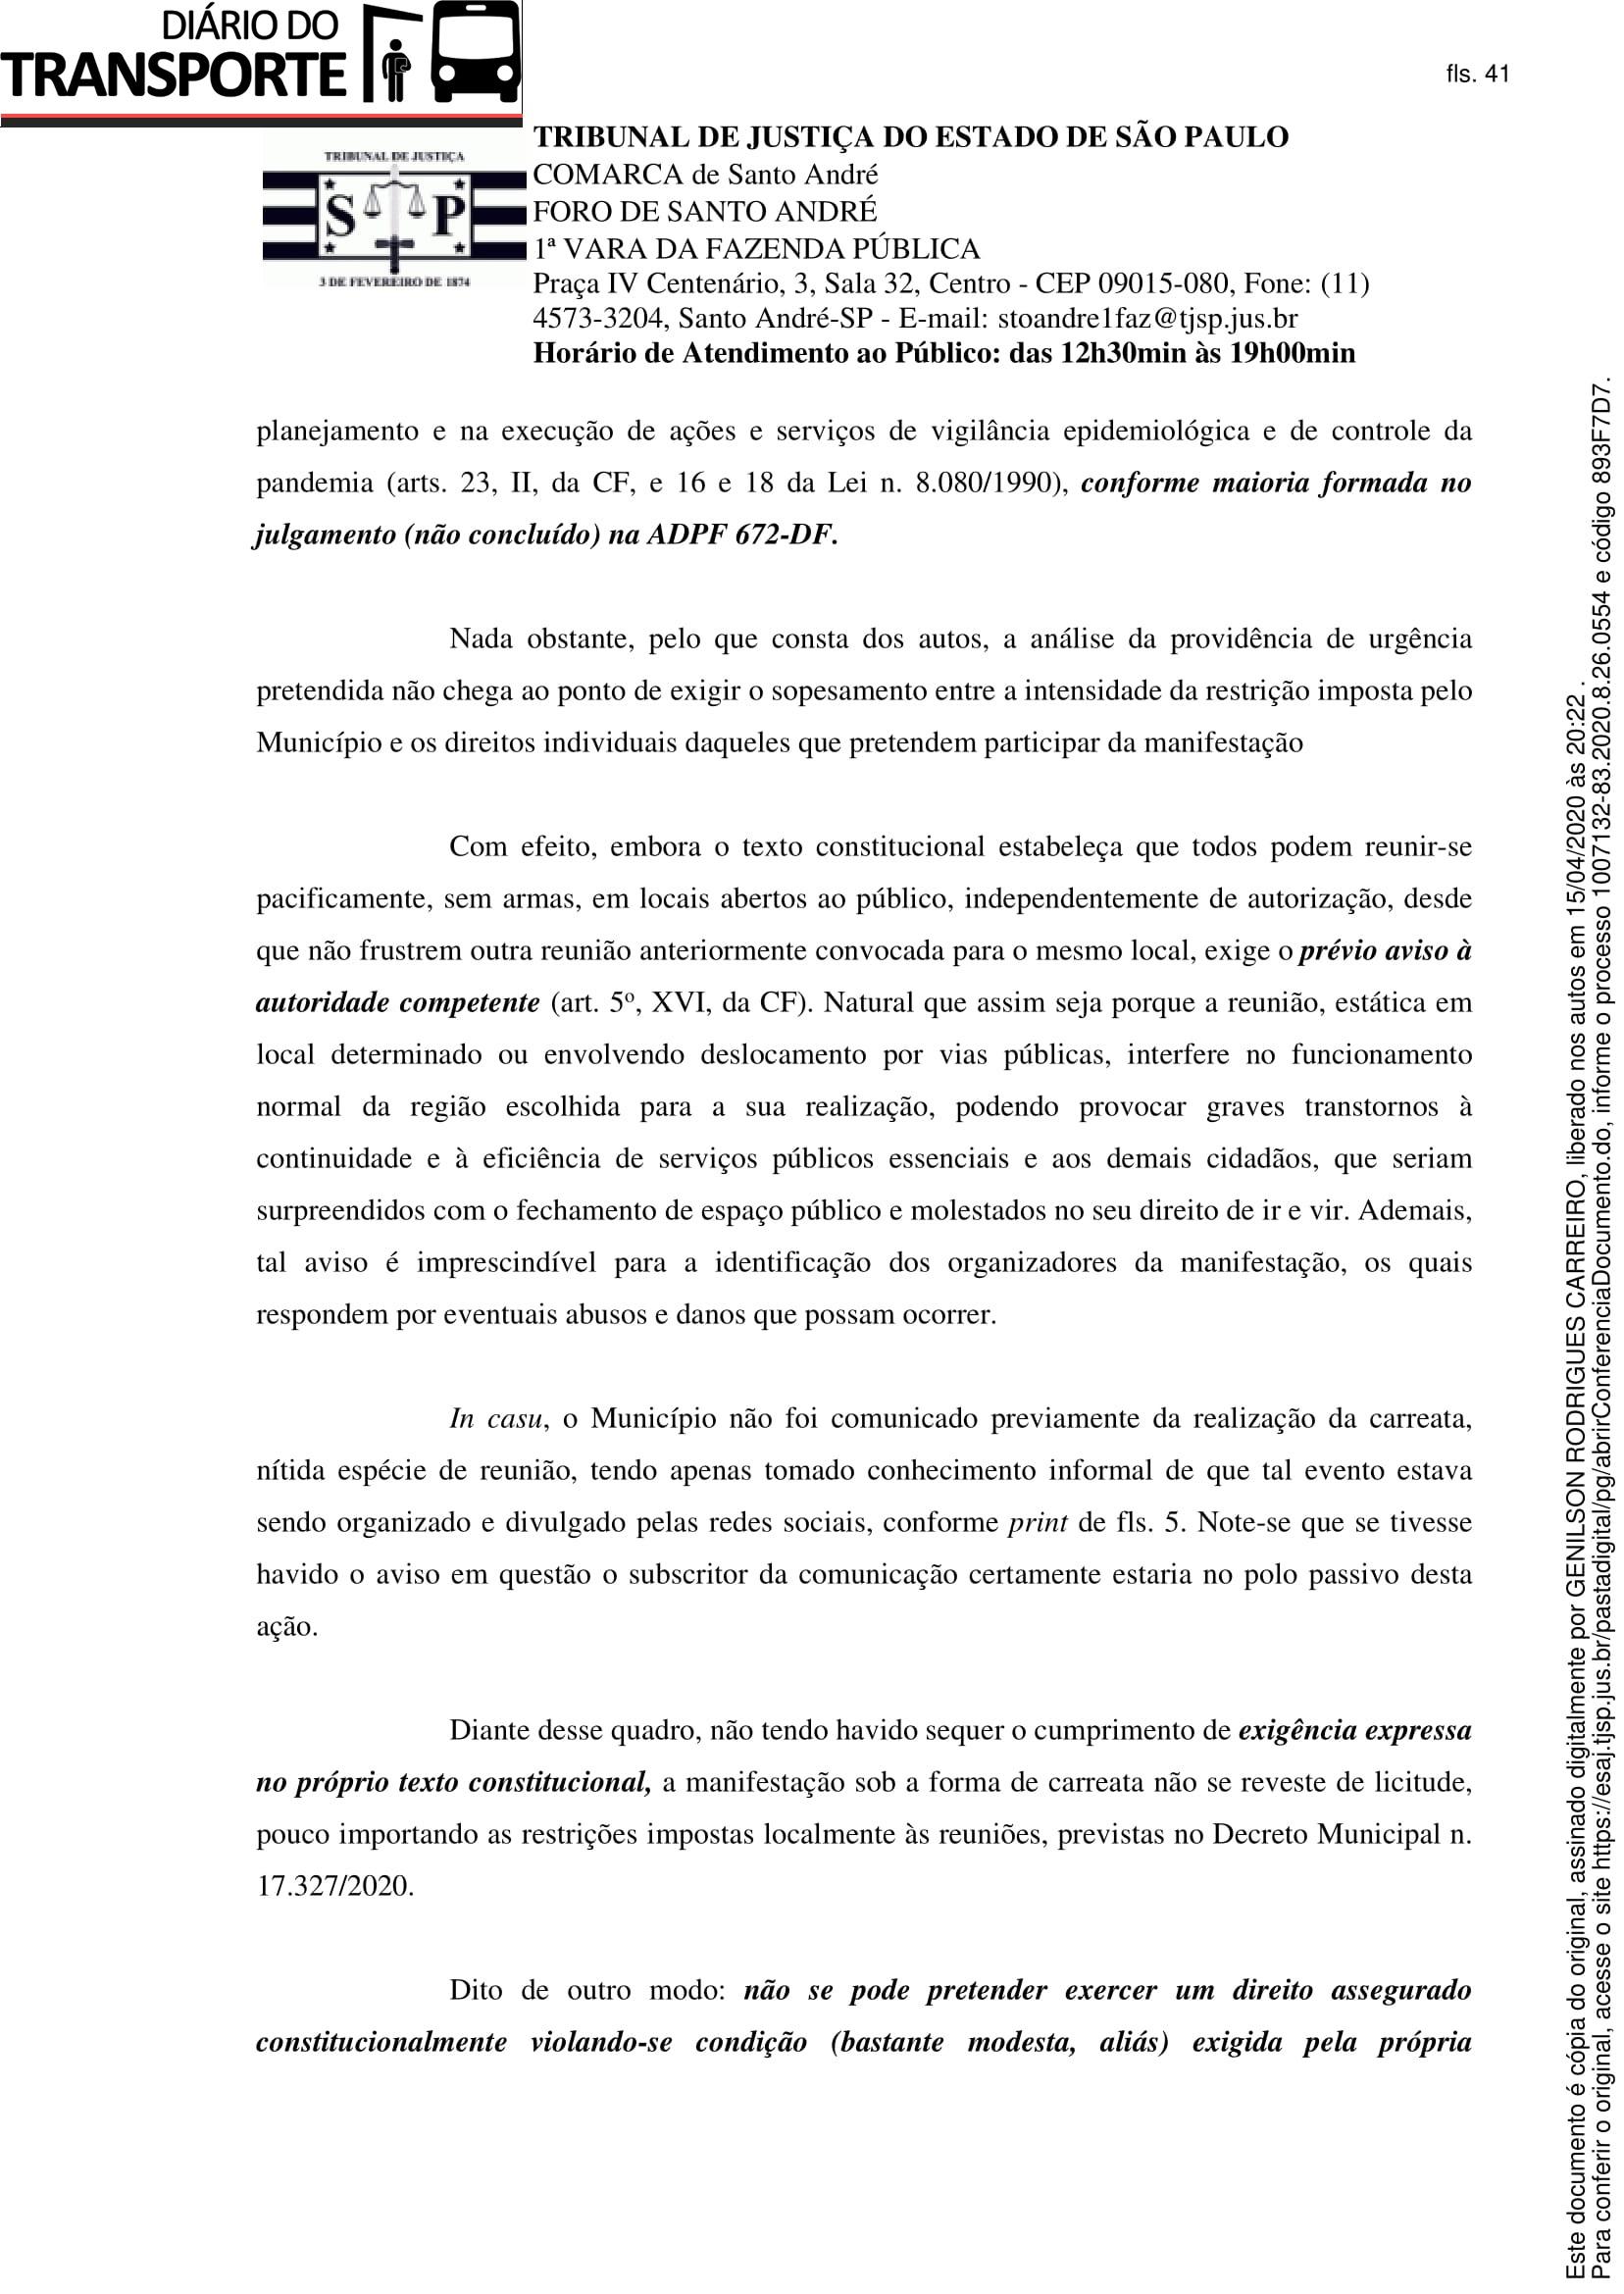 doc_83215240-2